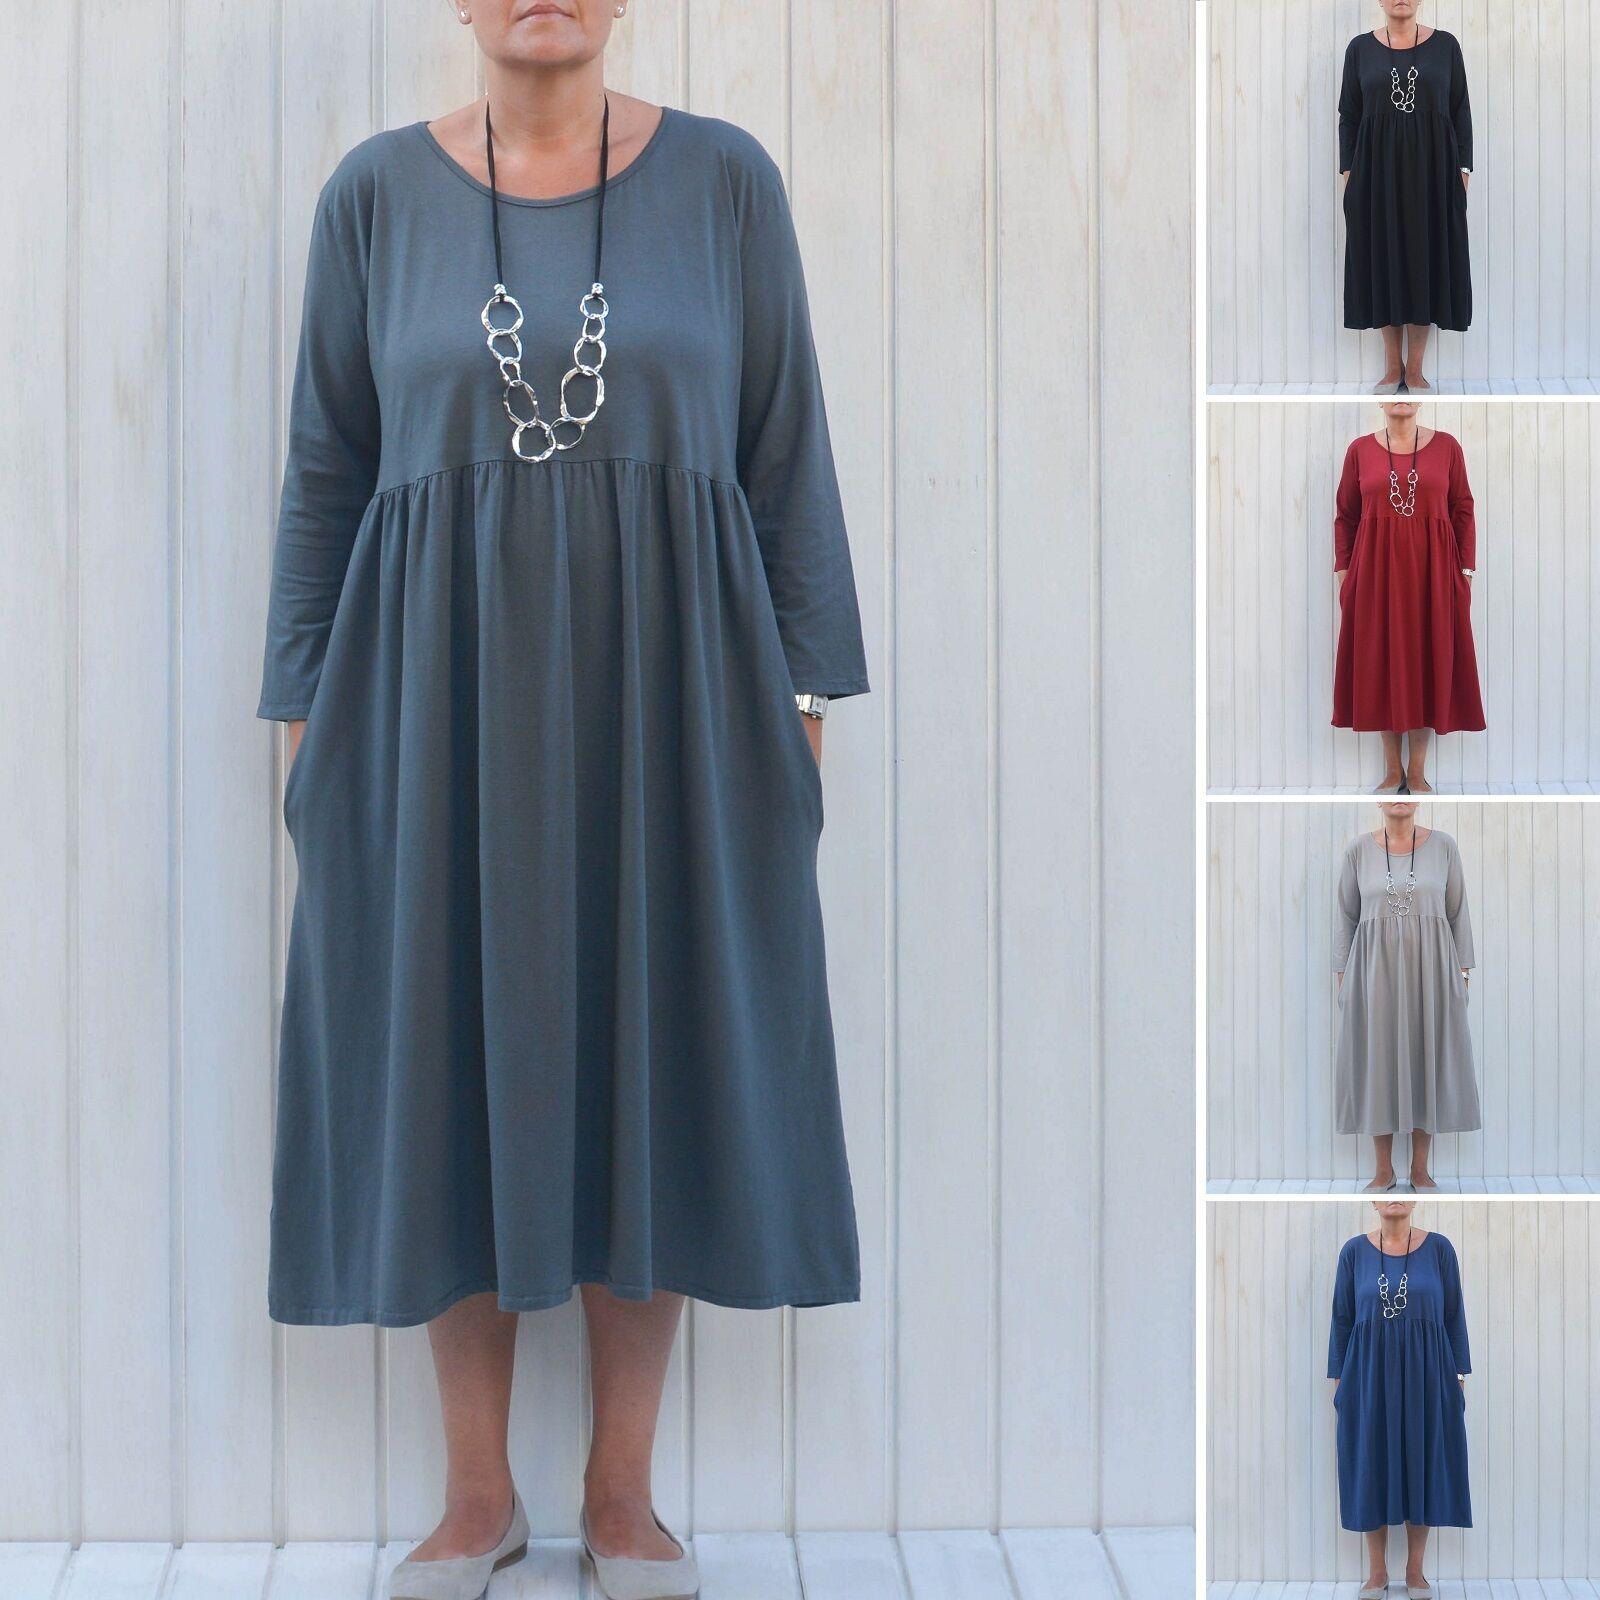 Ladies Lagenlook Plus Size 16 18 20 22 24 26  Womens Pleat Dress UK NEW 7015